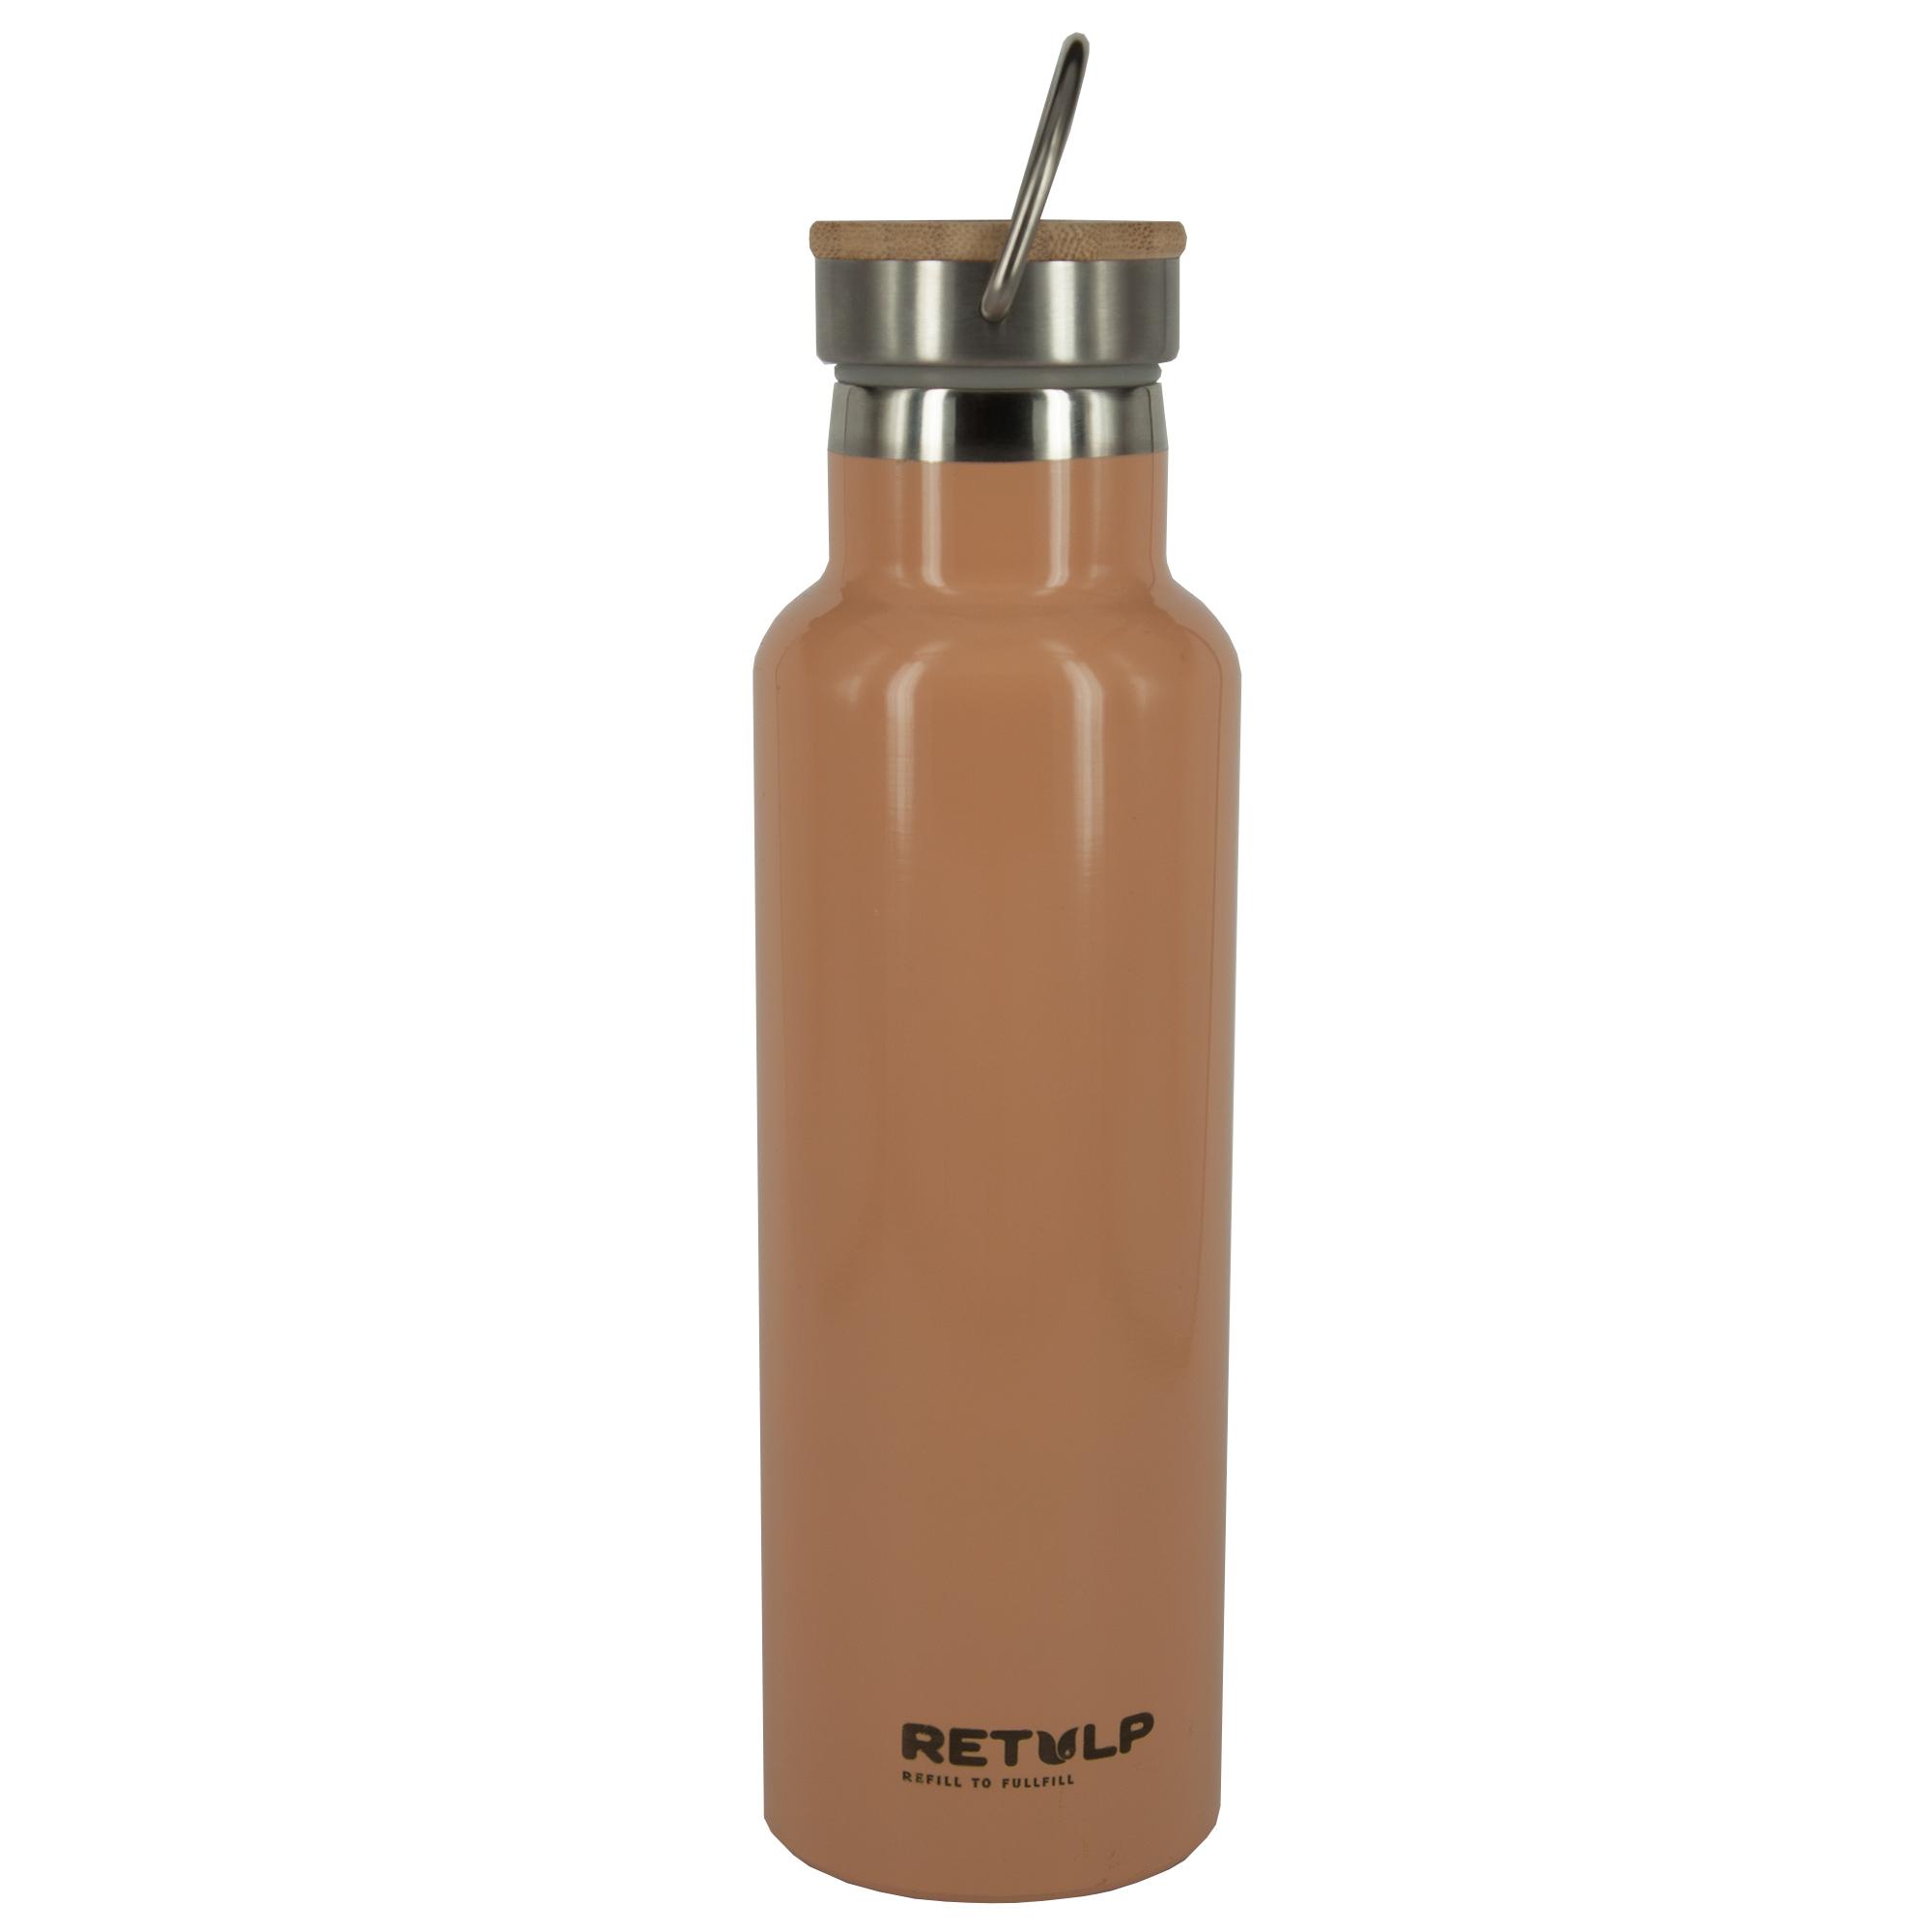 Retulp Urban Thermos Champagne Pink met Bamboo dop 600 ml